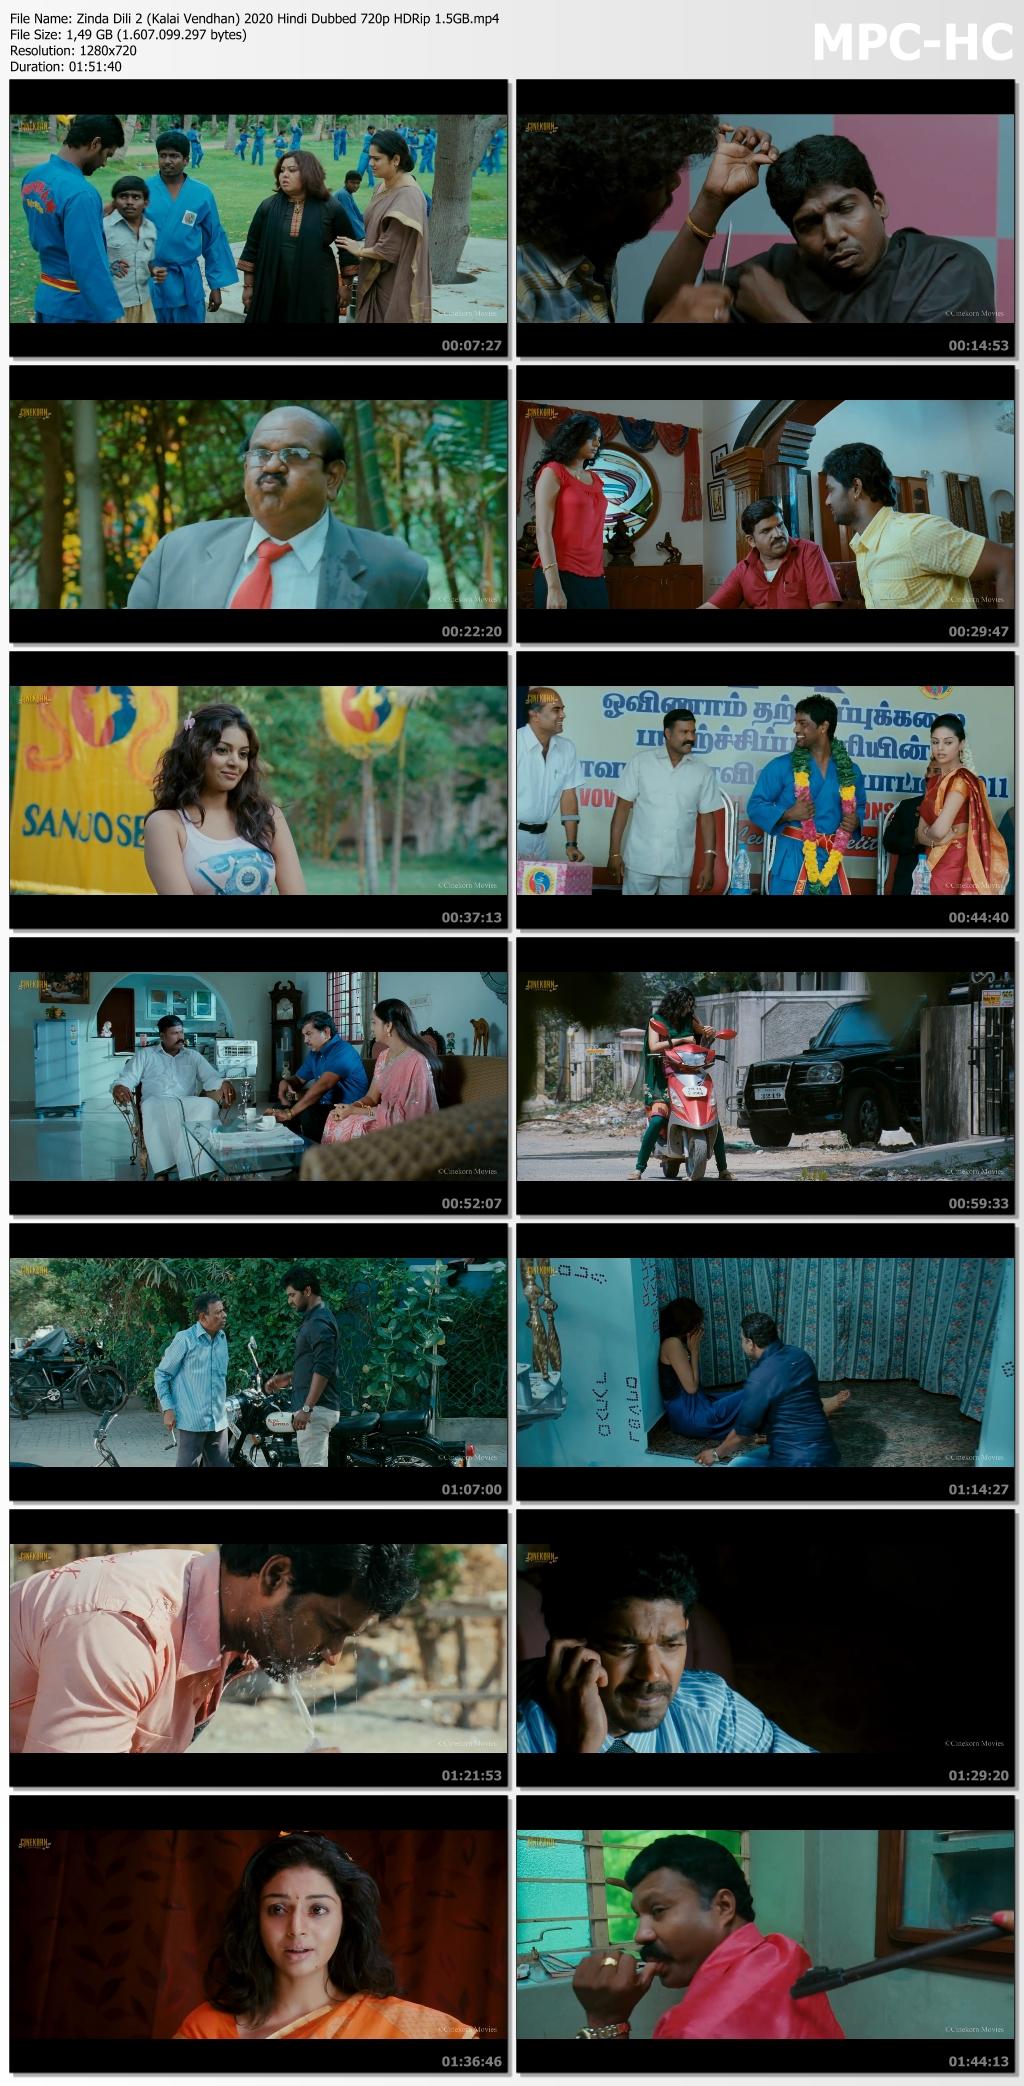 Zinda-Dili-2-Kalai-Vendhan-2020-Hindi-Dubbed-720p-HDRip-1-5-GB-mp4-thumbs